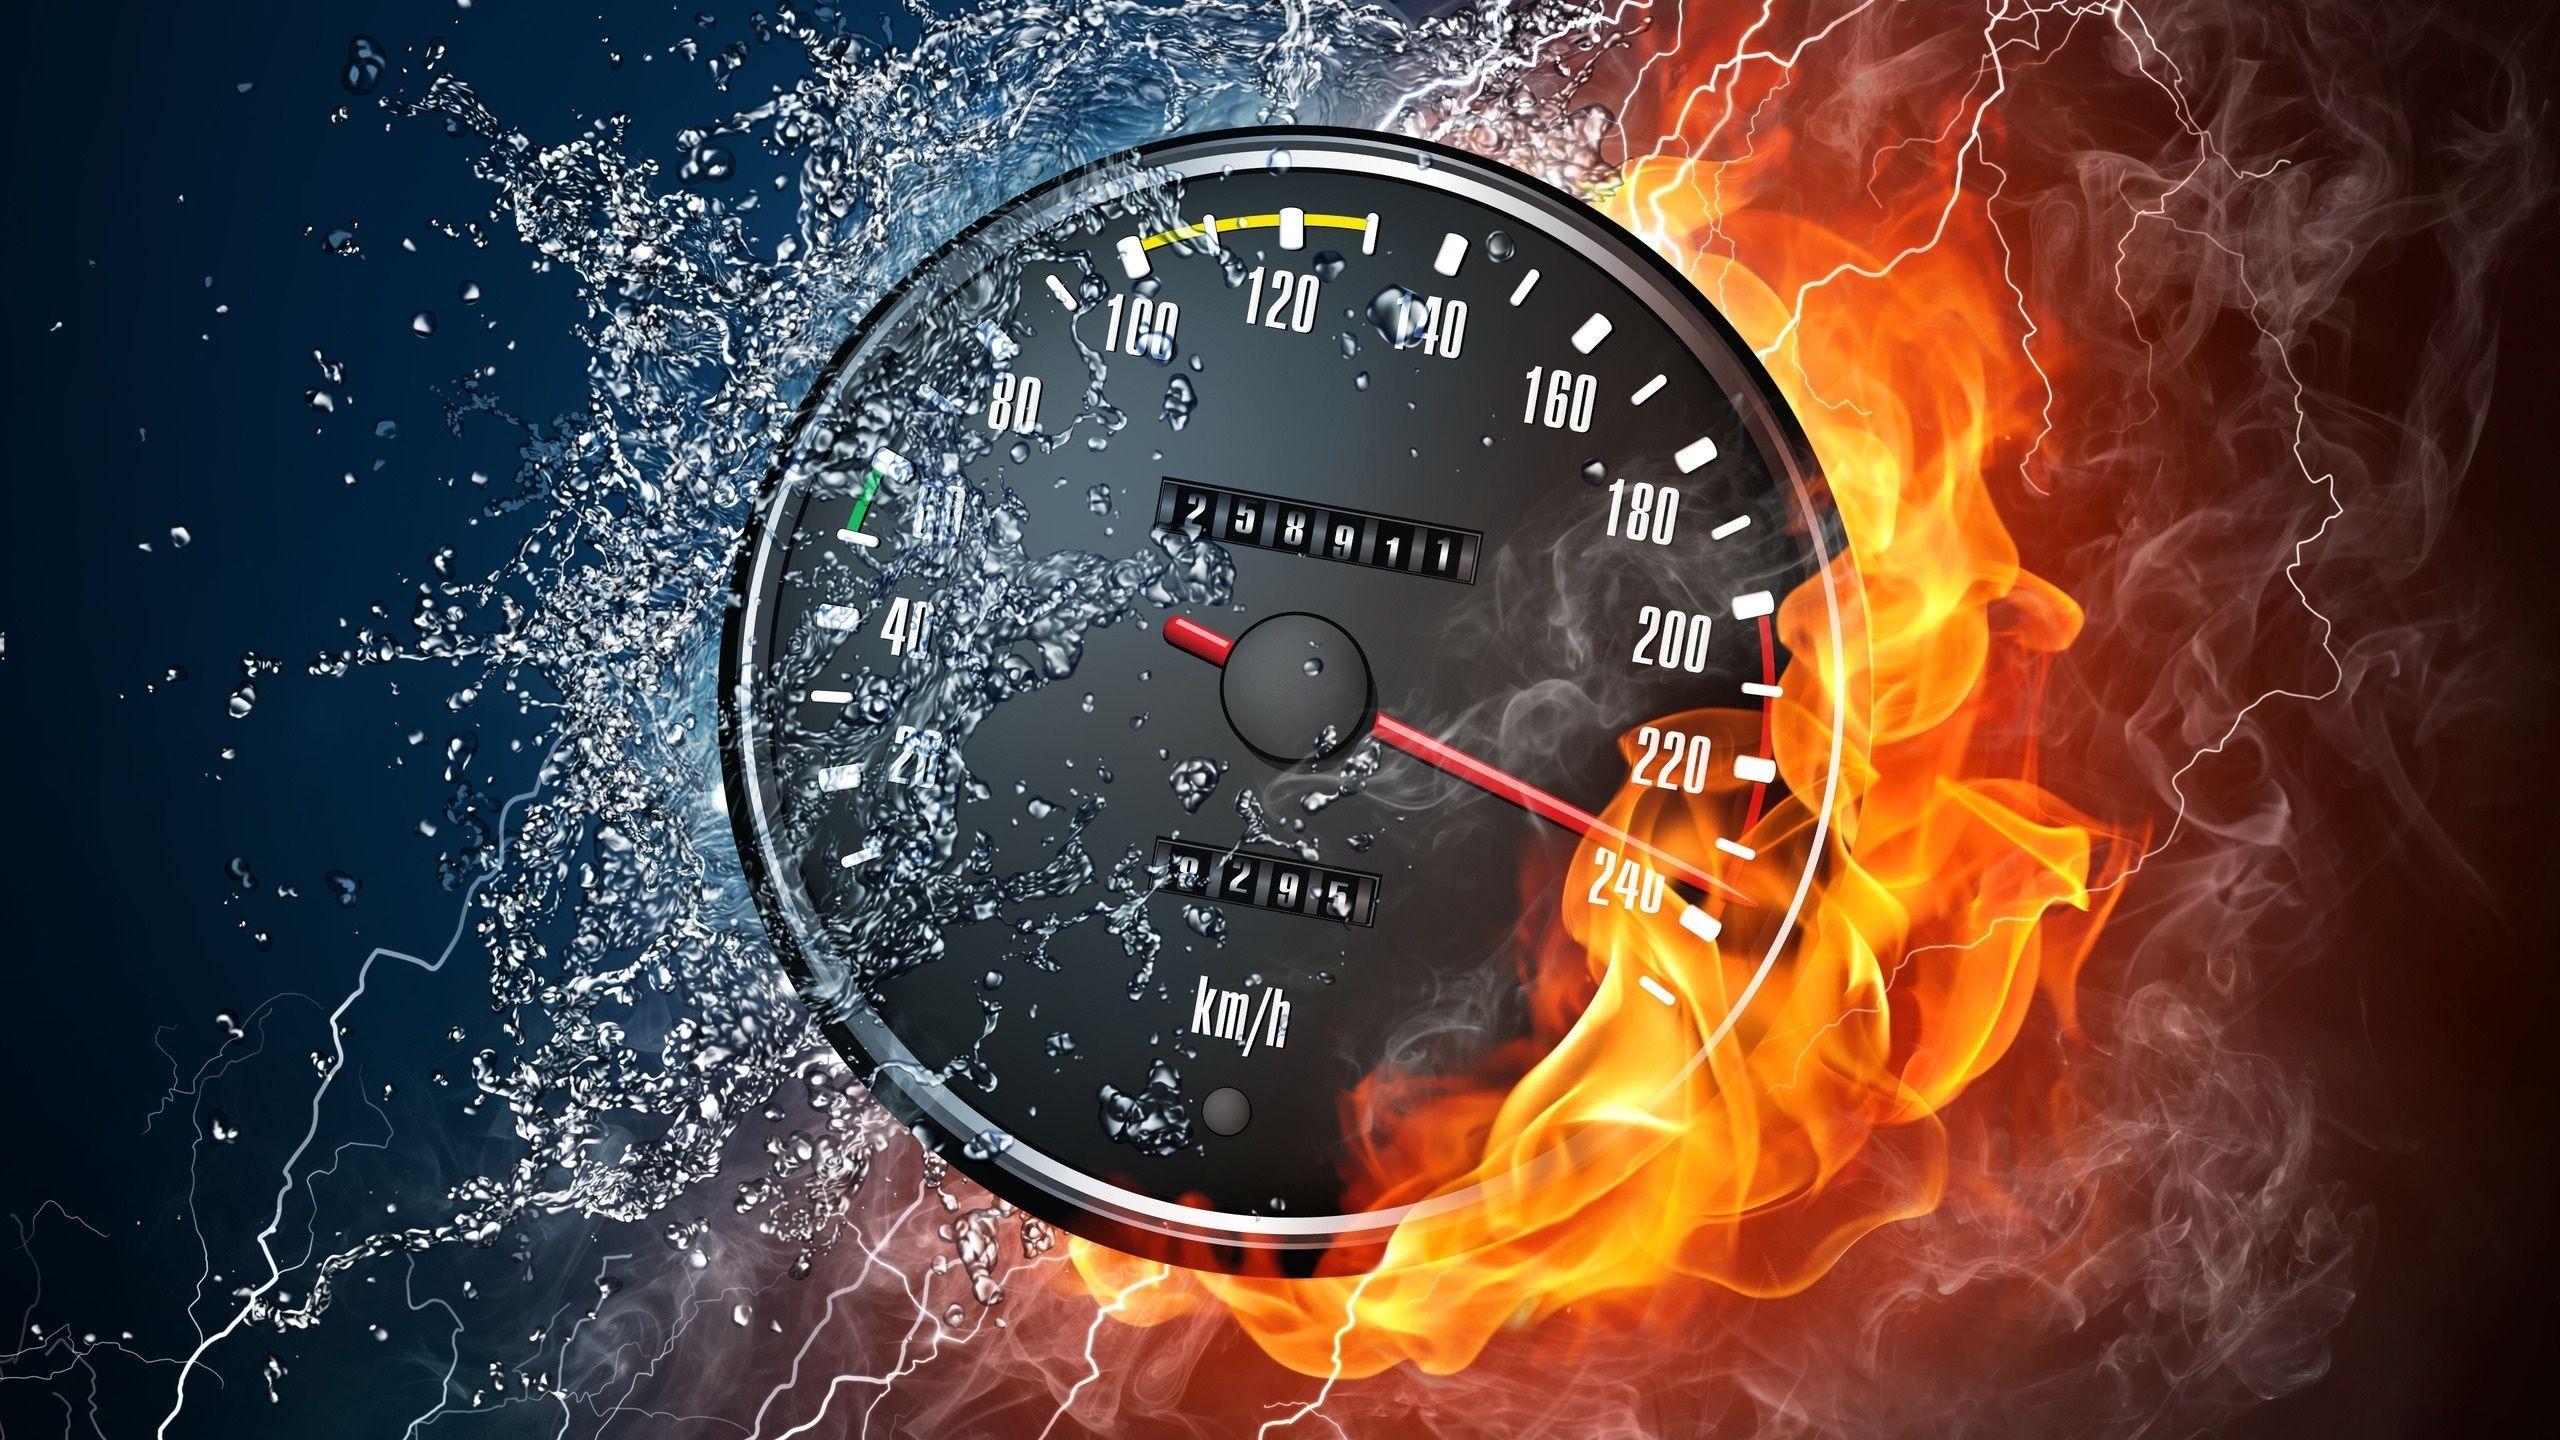 explore clock car hd and more high speed speedometer mac wallpaper